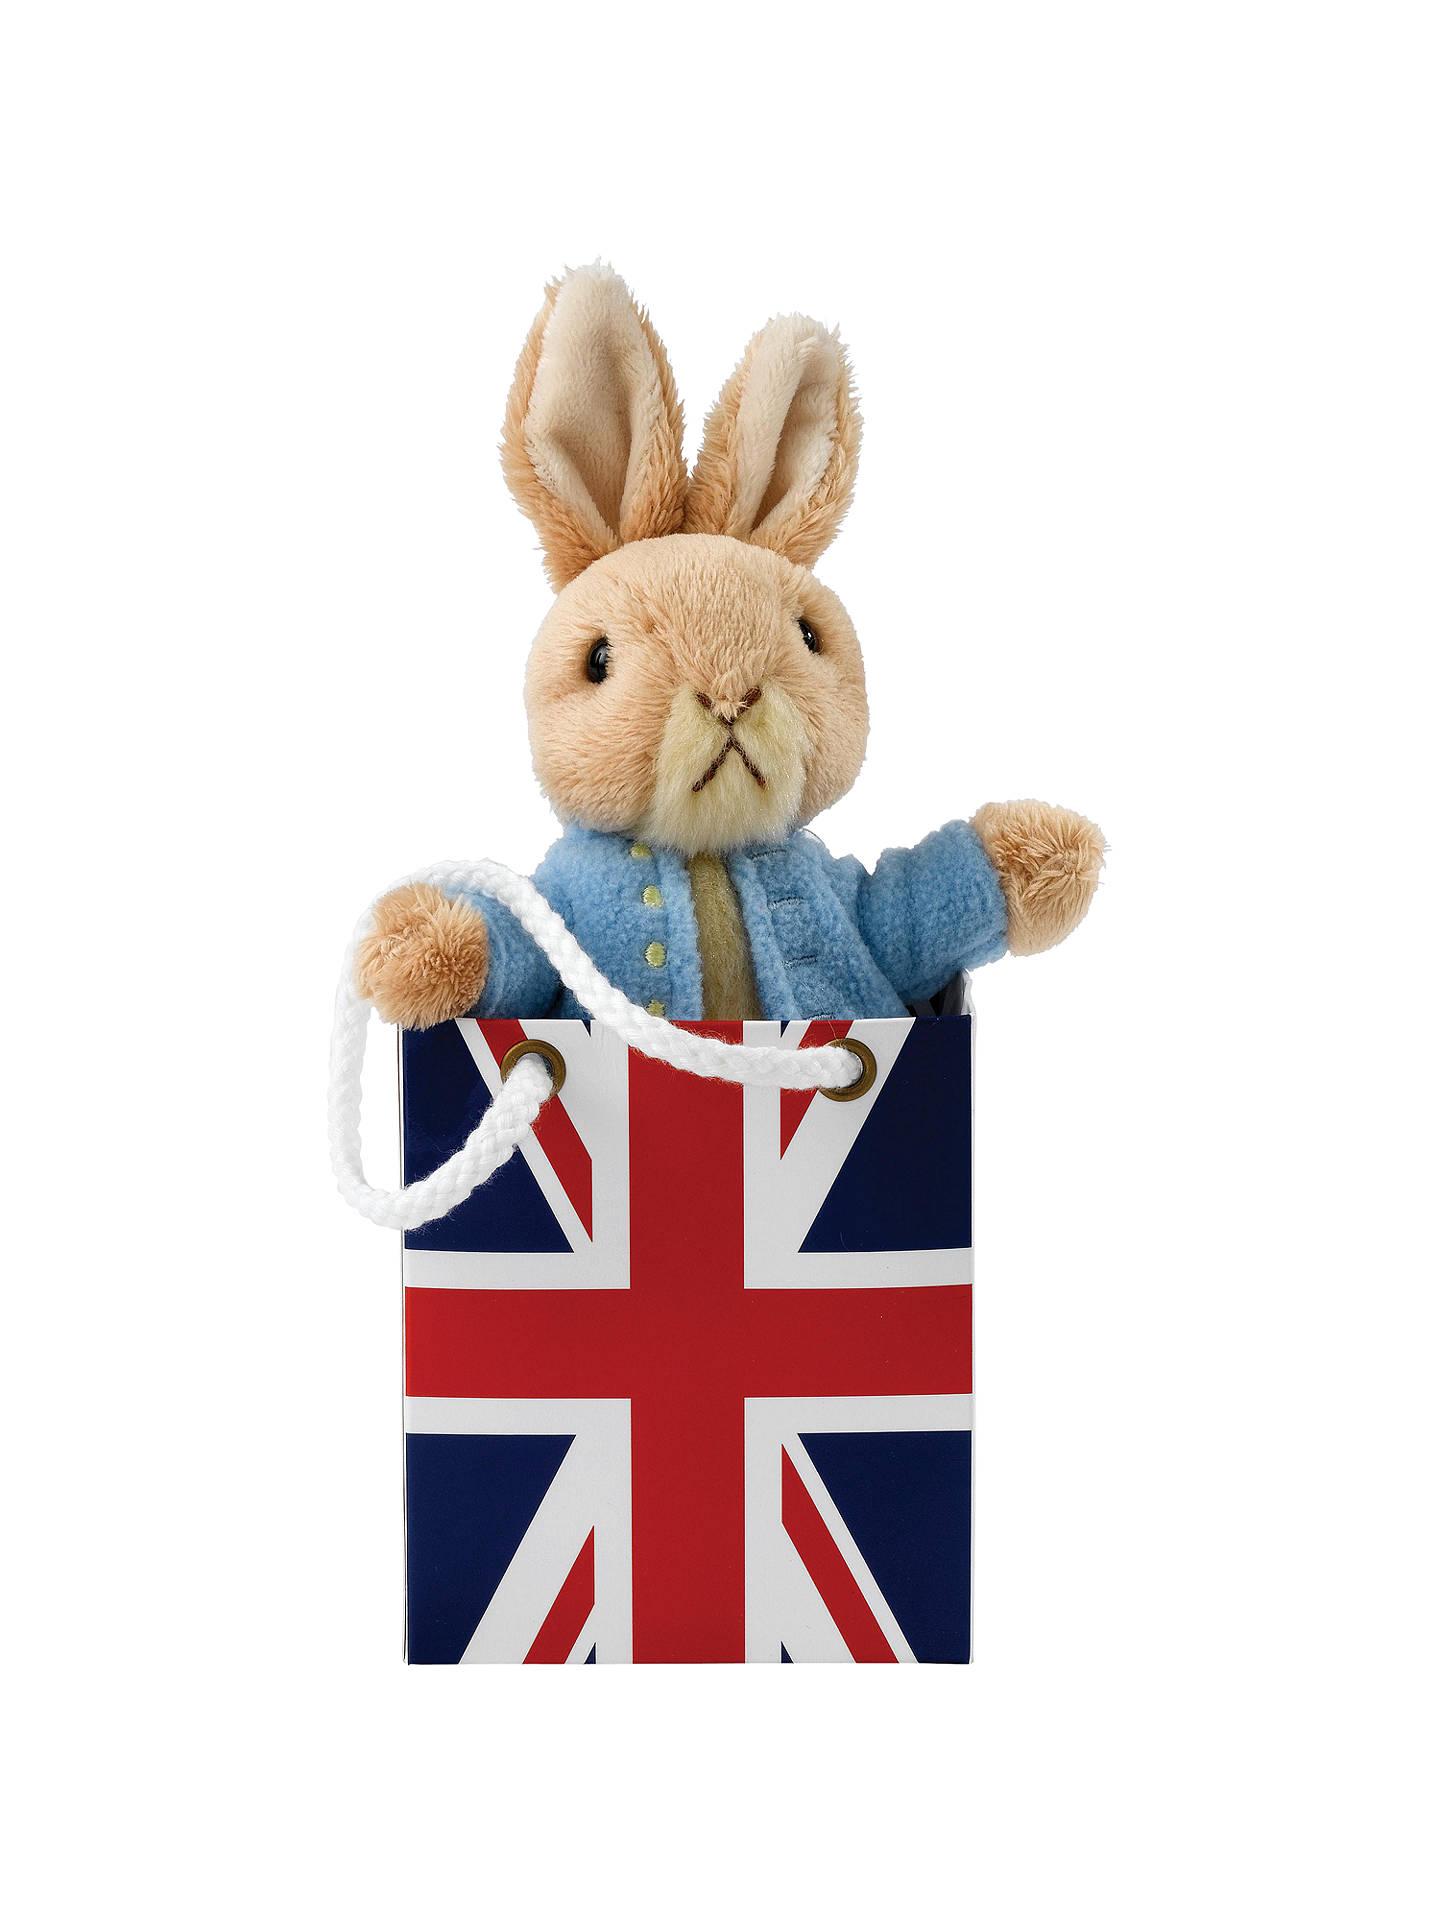 Buy Beatrix Potter Peter Rabbit Union Jack Bag Plush Soft Toy Baby Gift Online at johnlewis